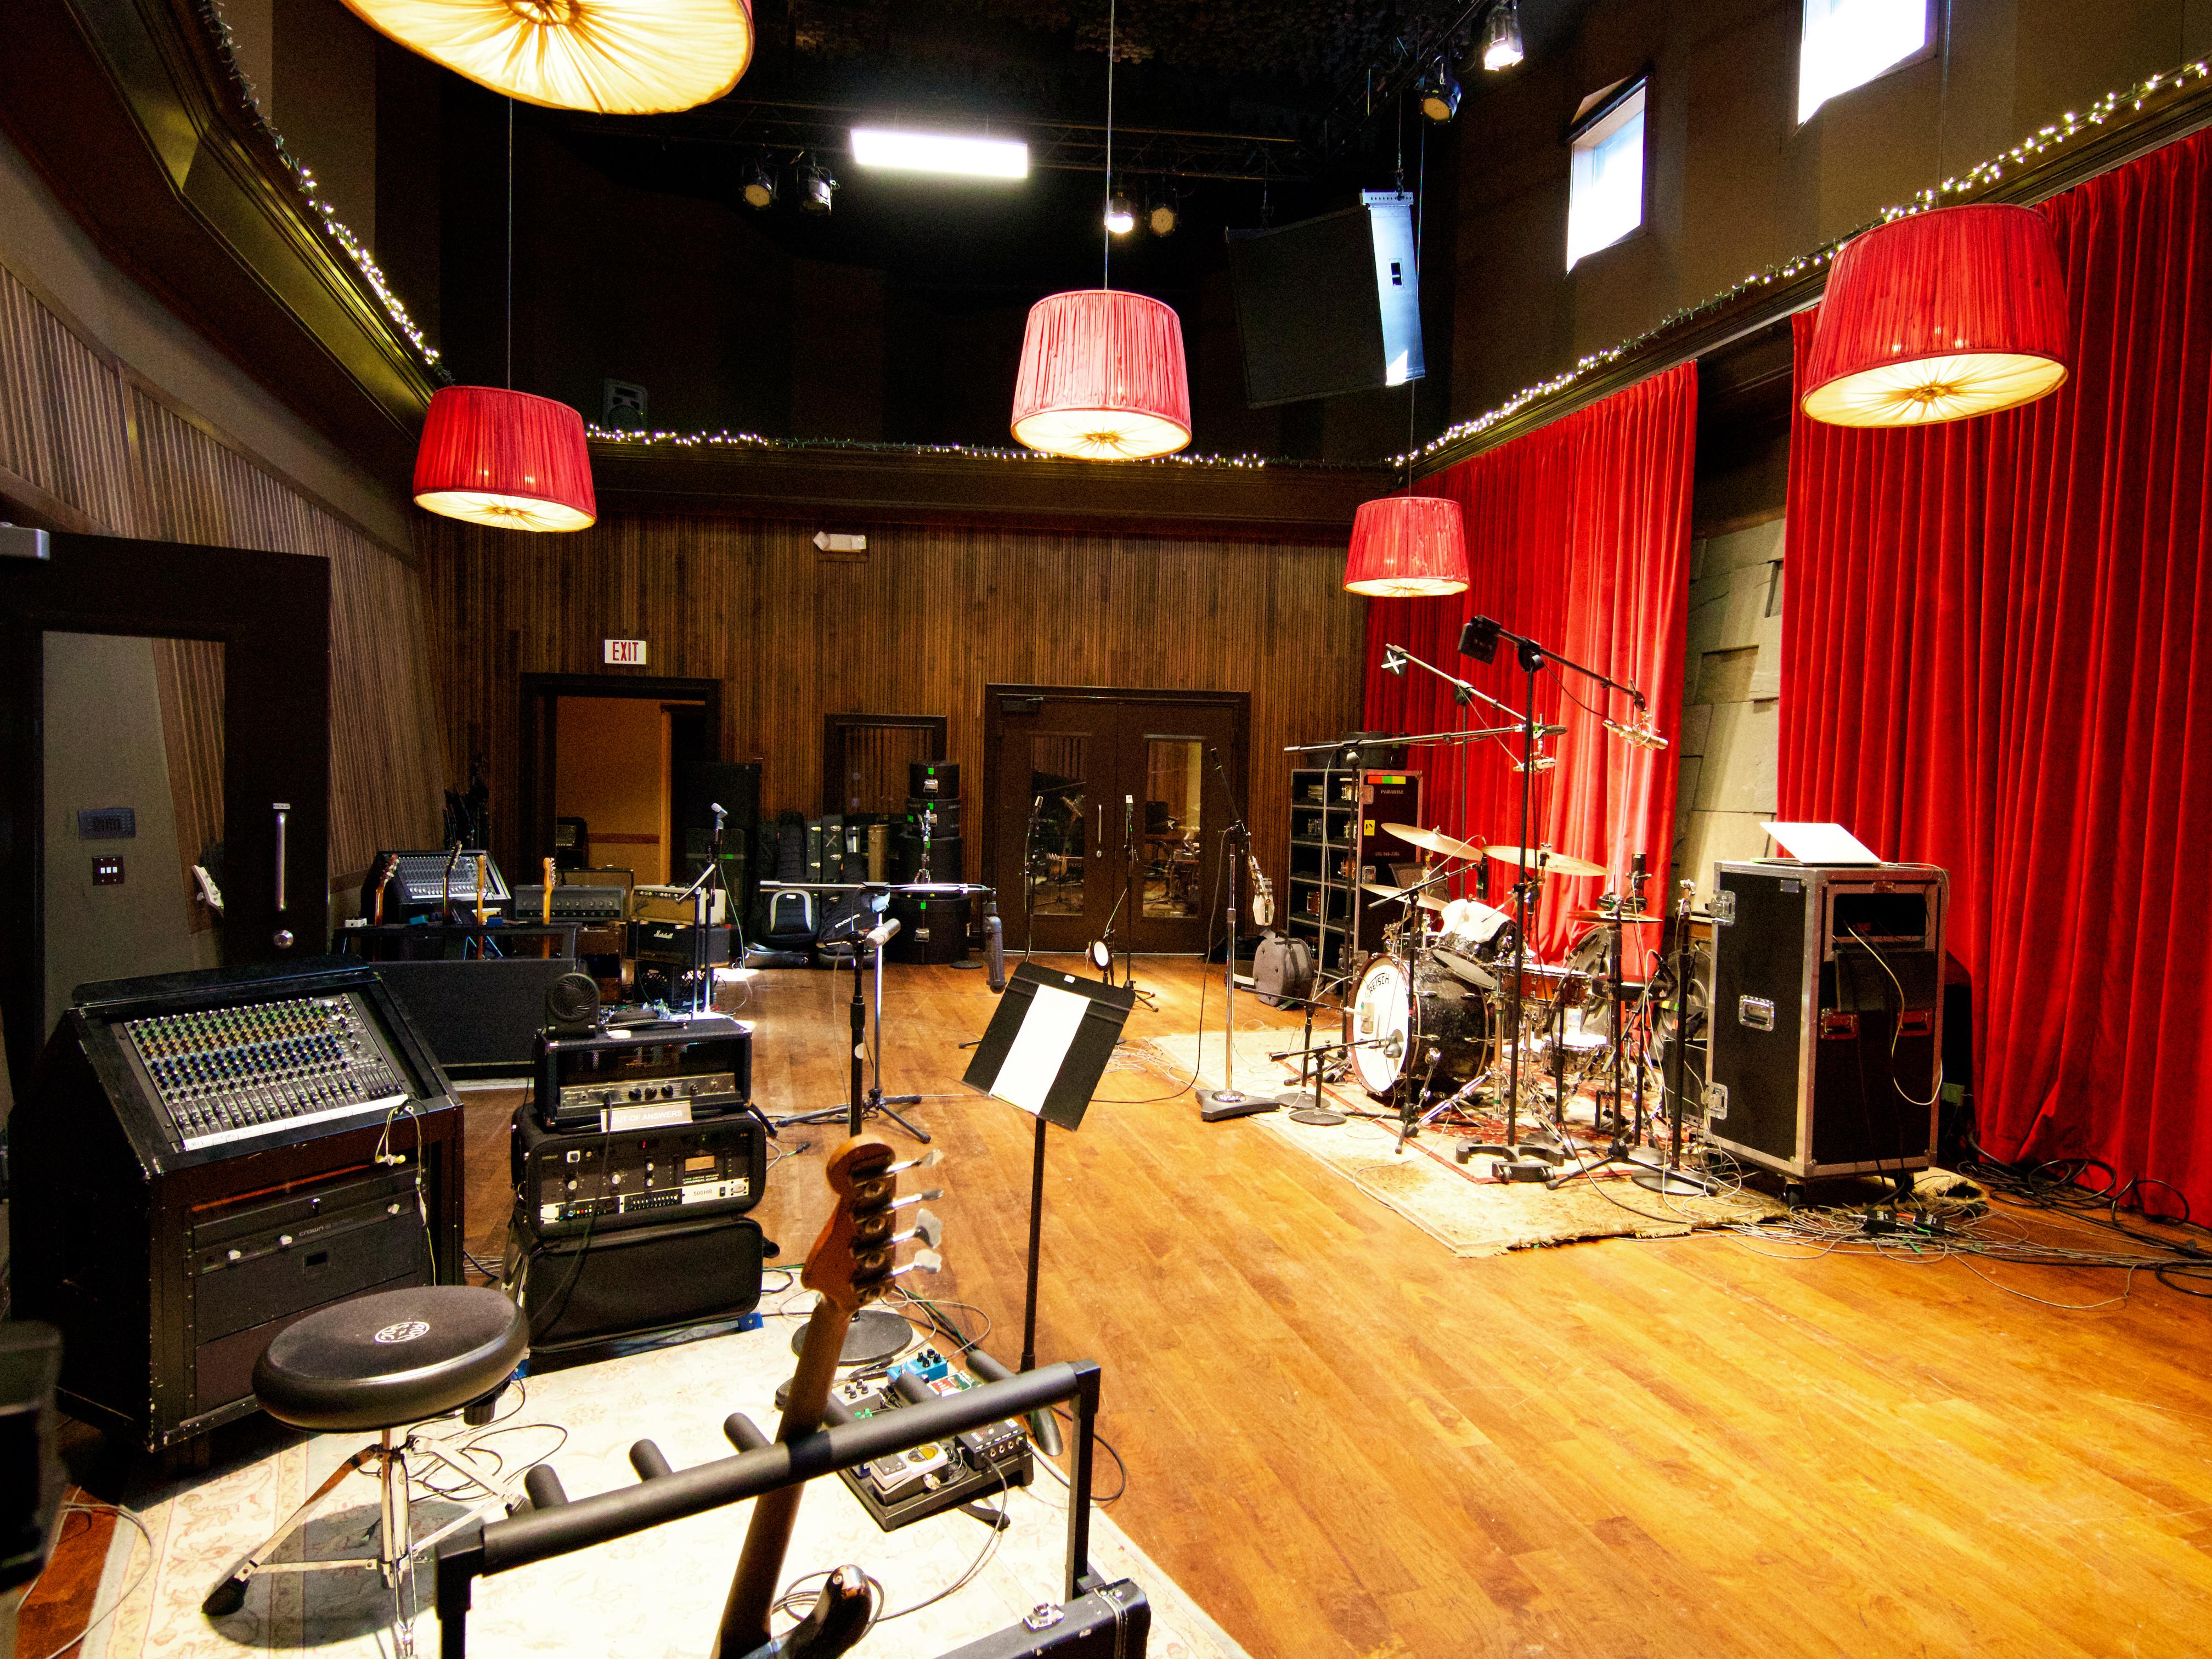 studio-d-live-room-opposite